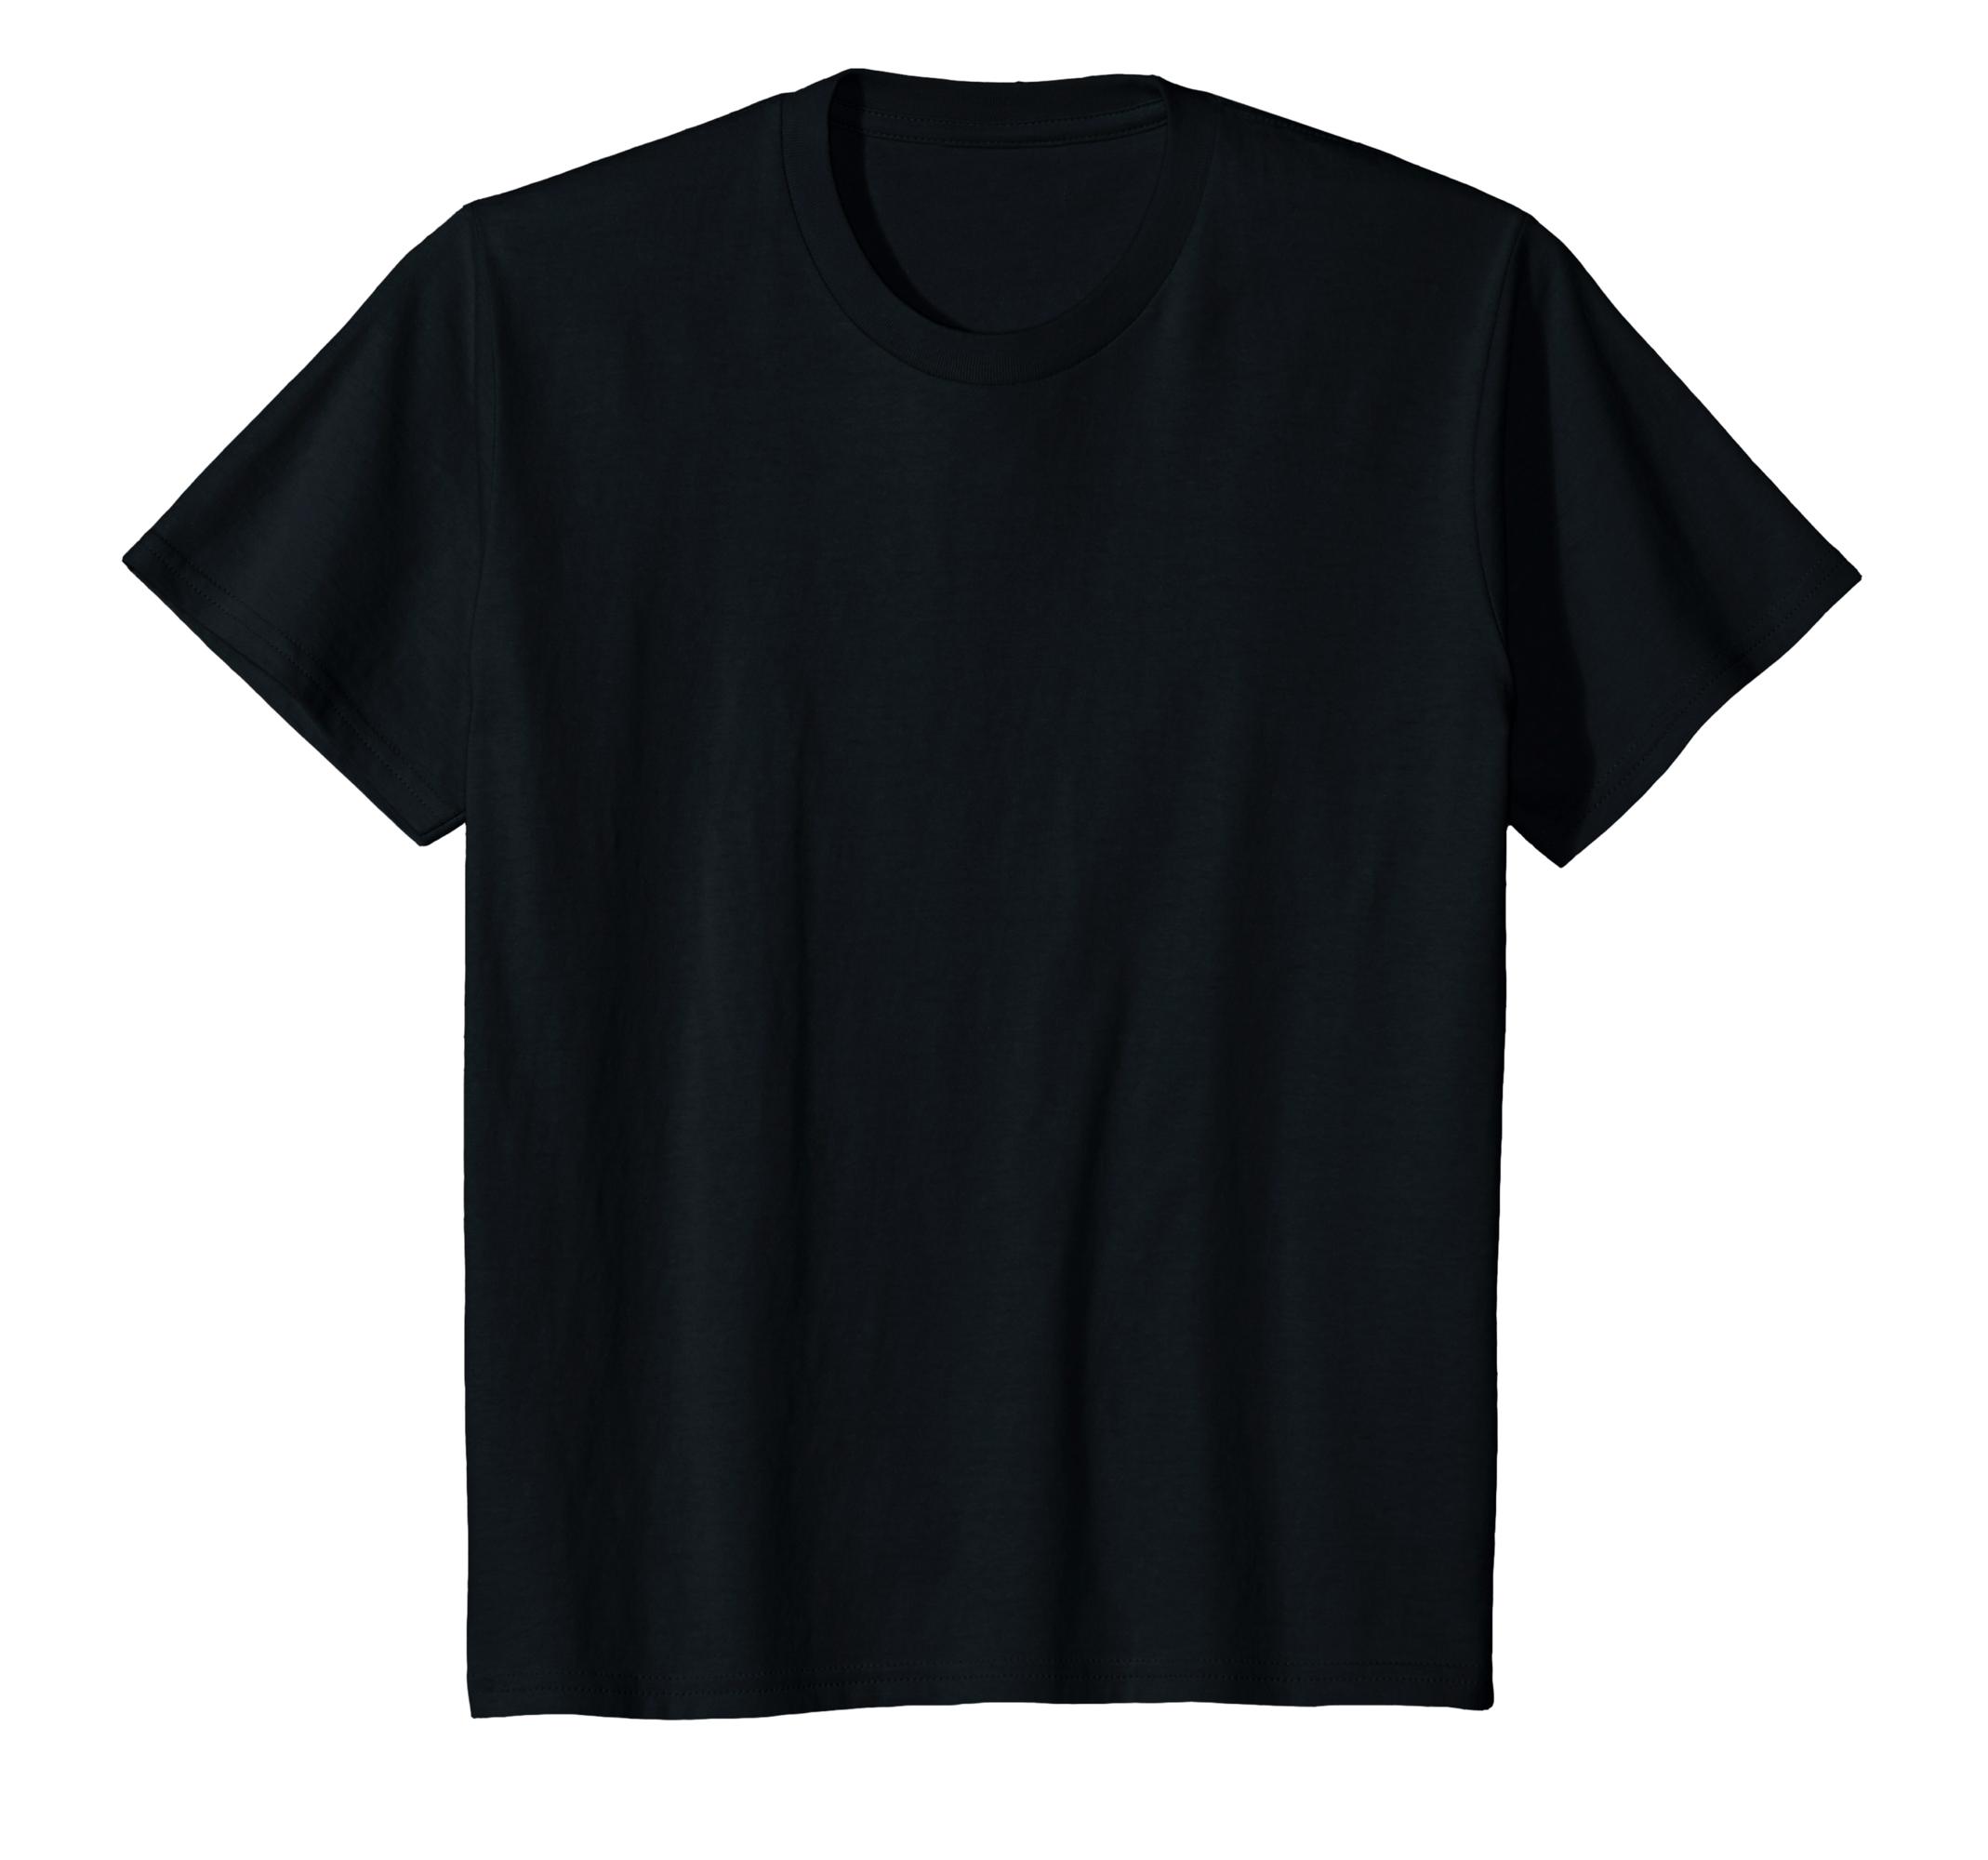 Street Baller Basketball Boys Girls Kids Childrens T-Shirt